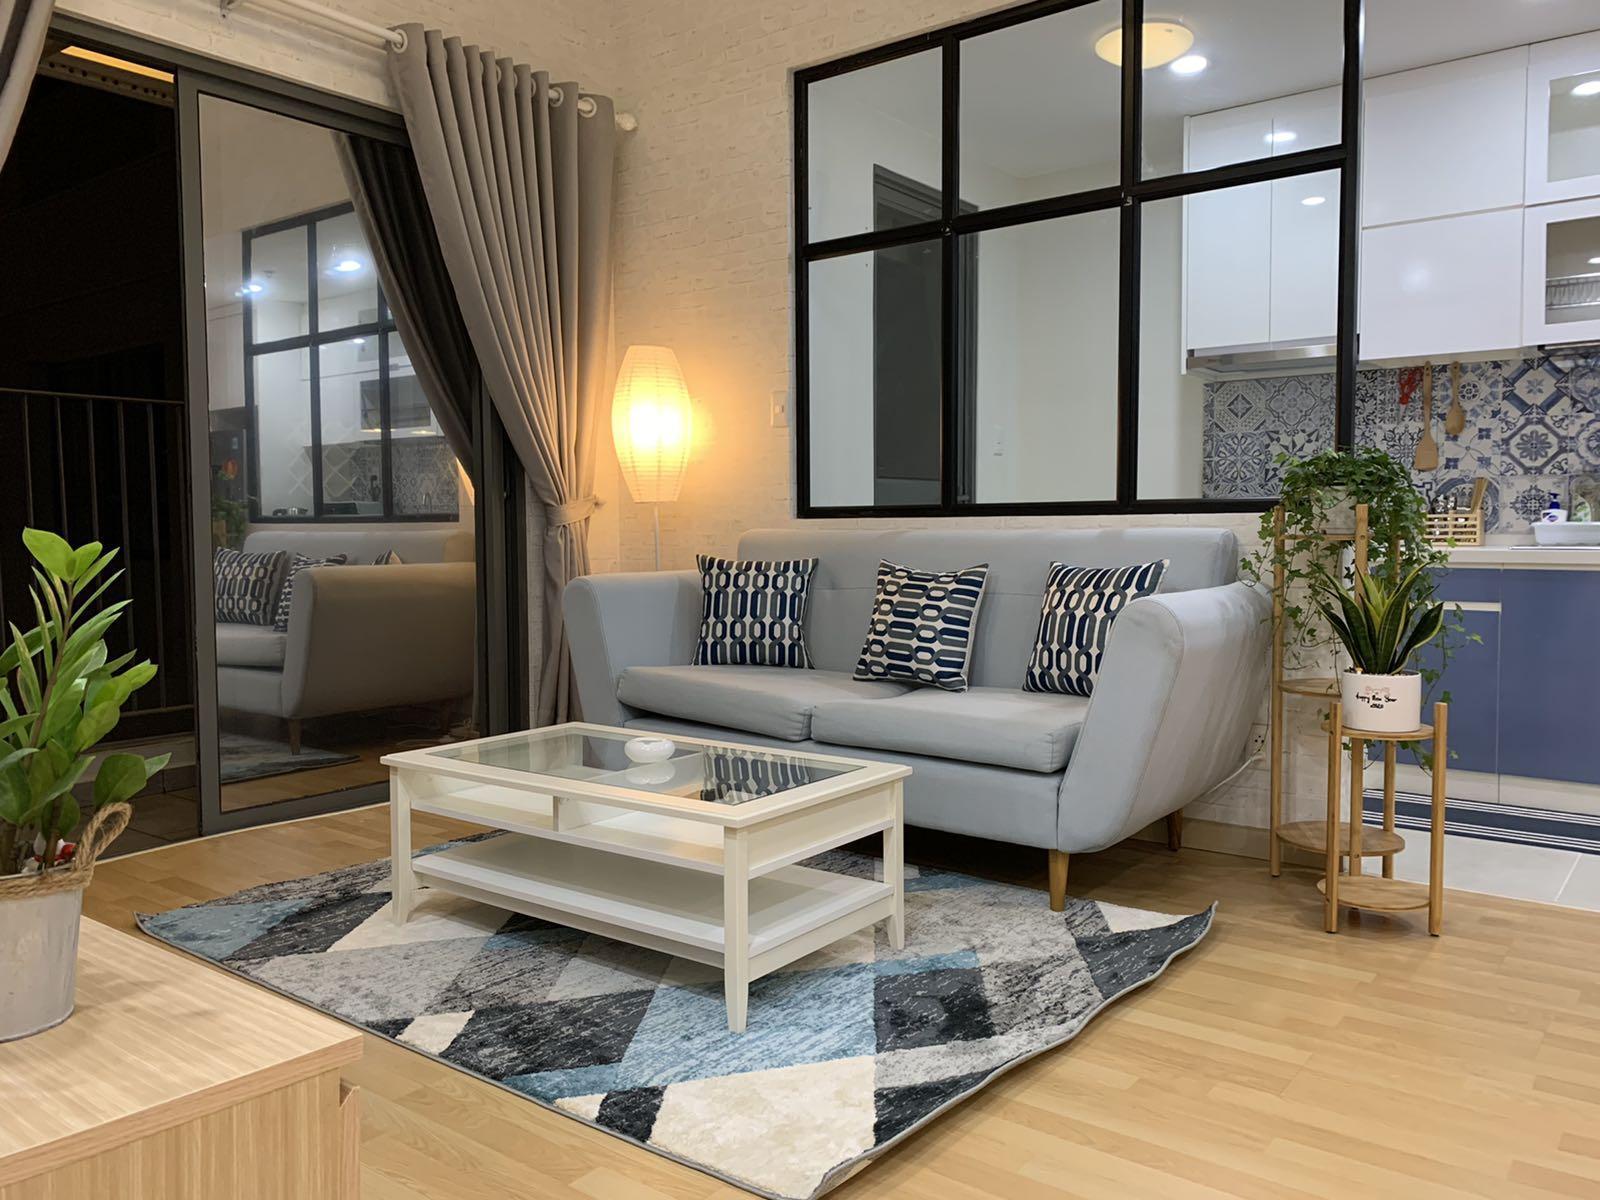 LARGE 2 Bedroom Midtown HCM Apartment